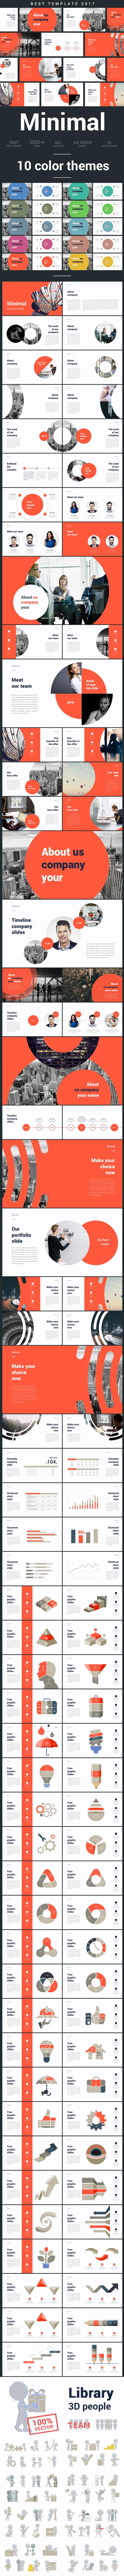 Minimal Creative Powerpoint Template - Creative PowerPoint Templates